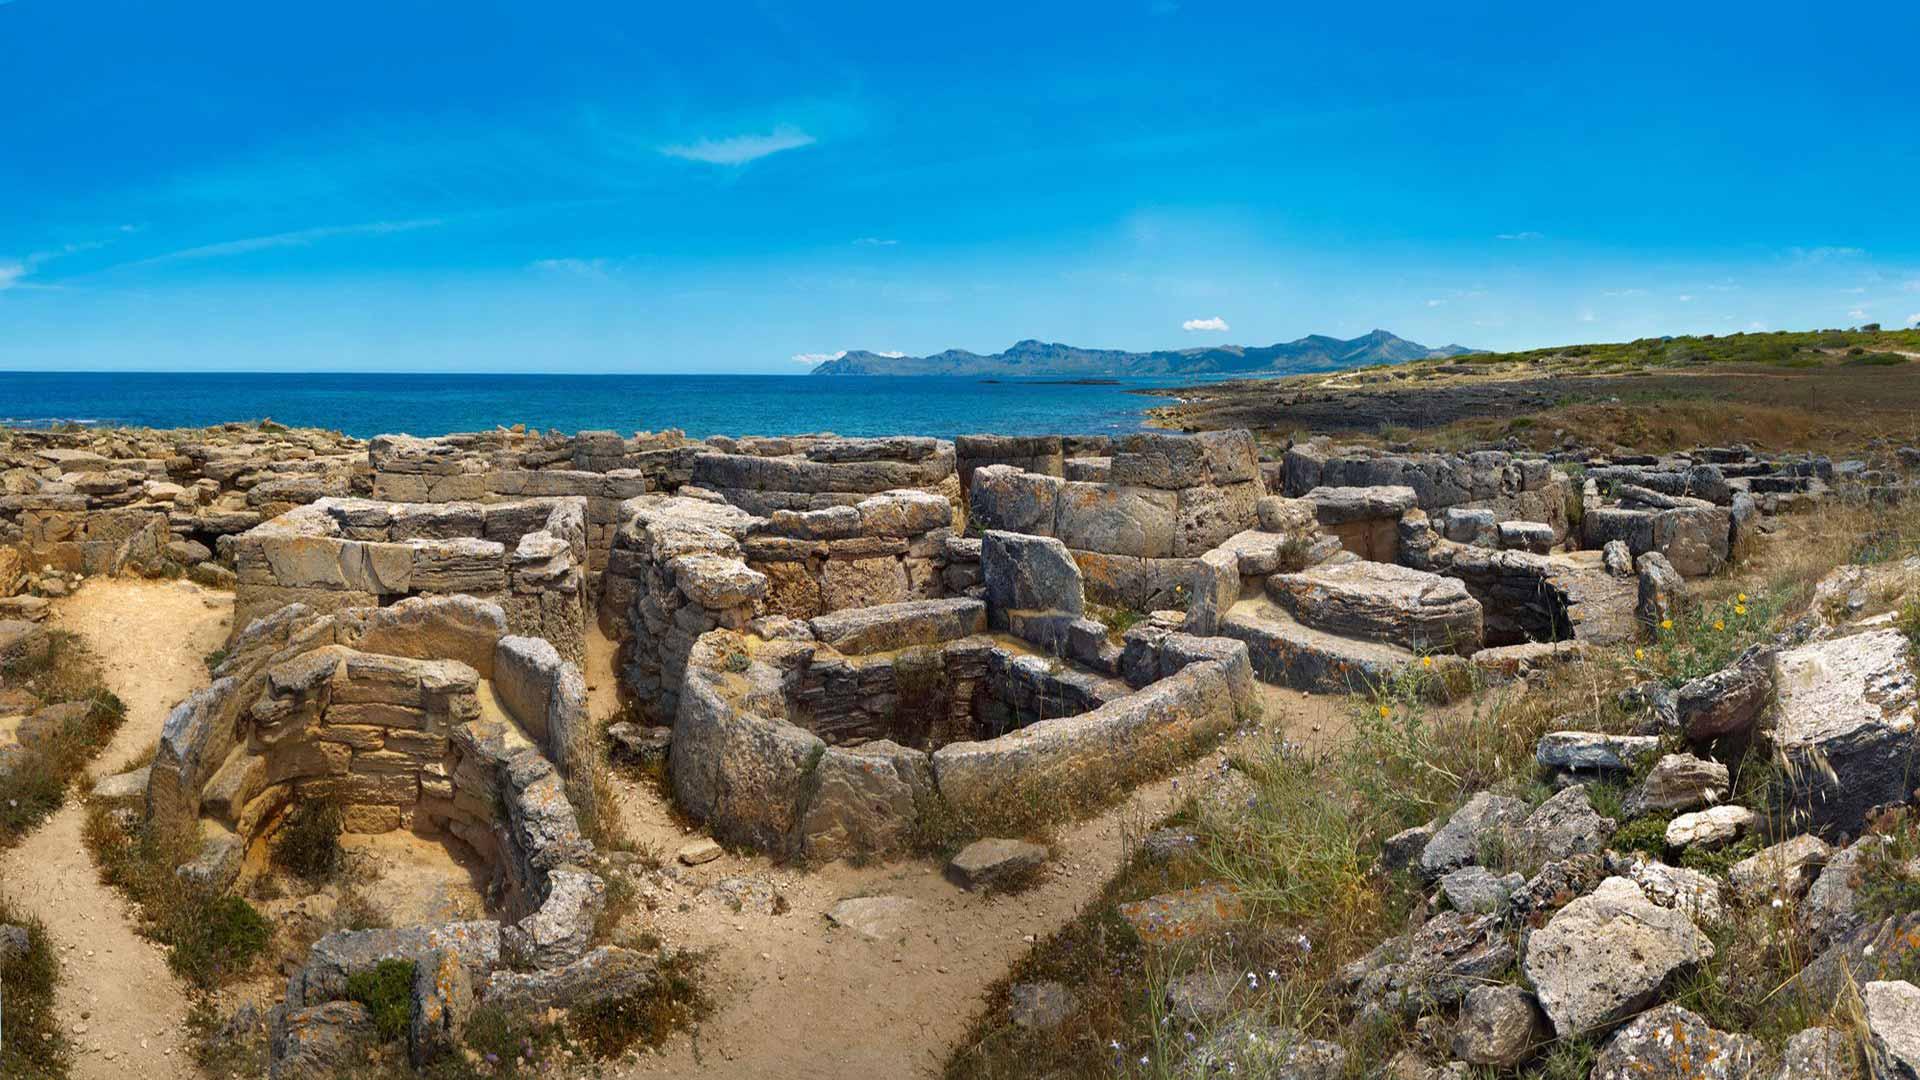 Imagen Necrópolis Punta dels Fenicis. Son Real